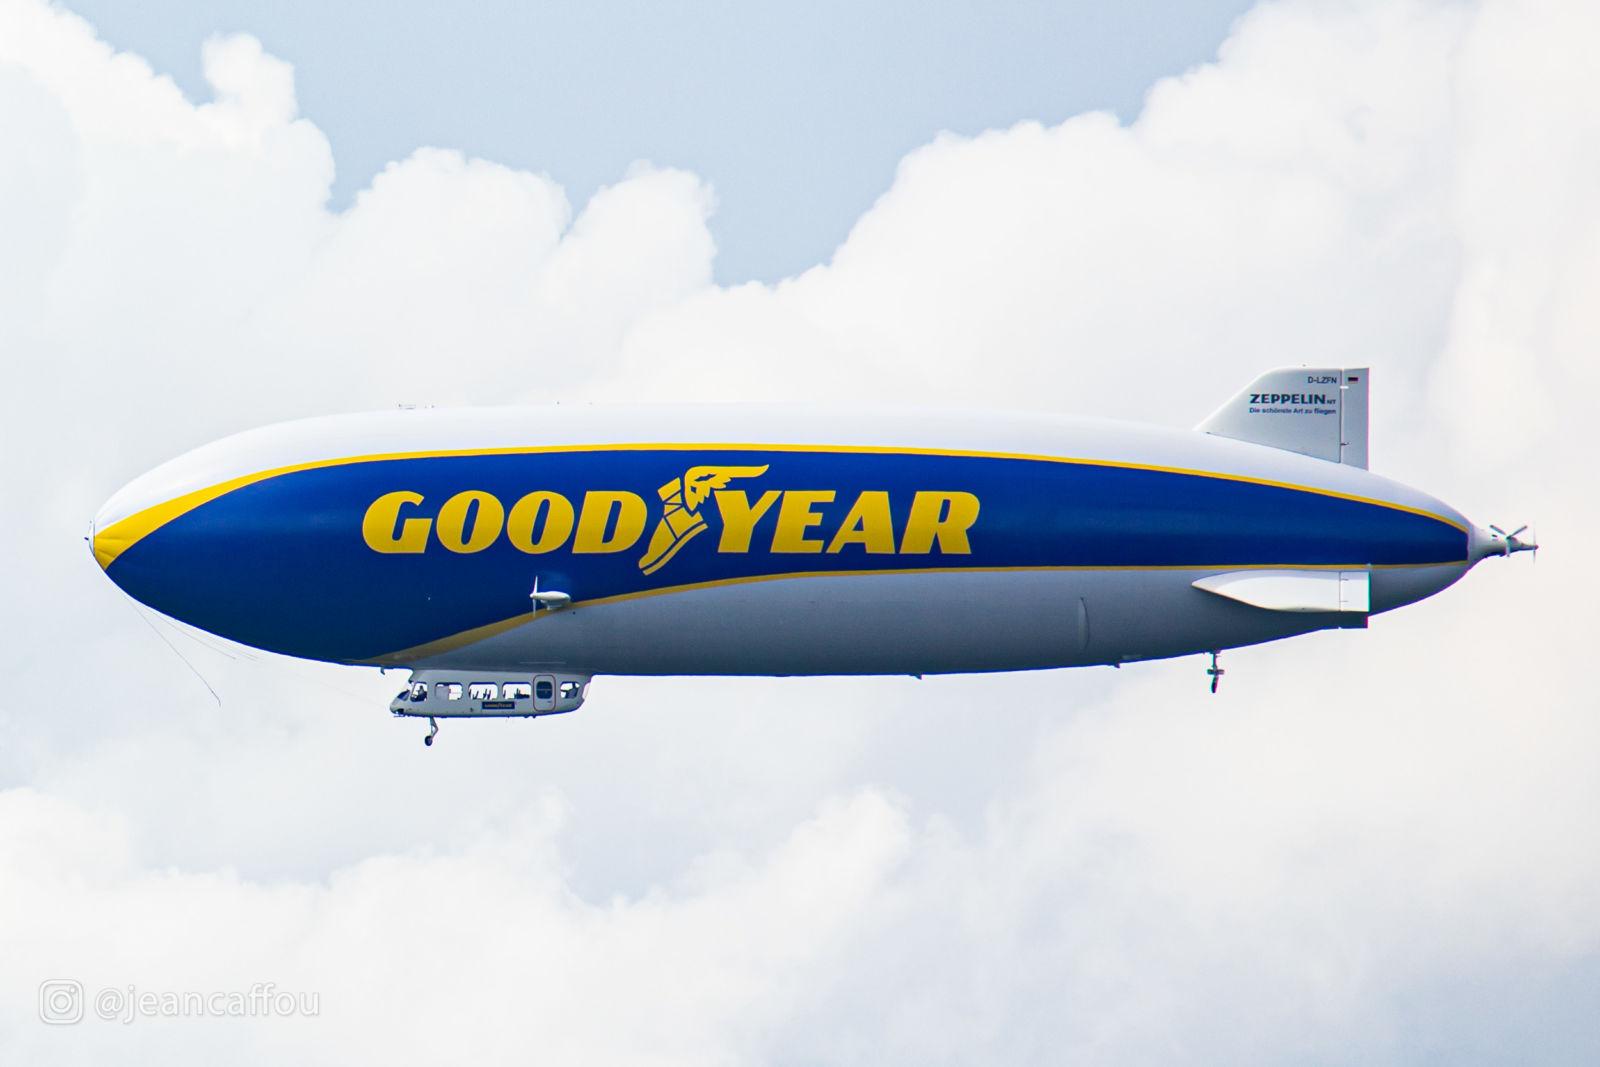 Goodyear Blimp - Zeppelin